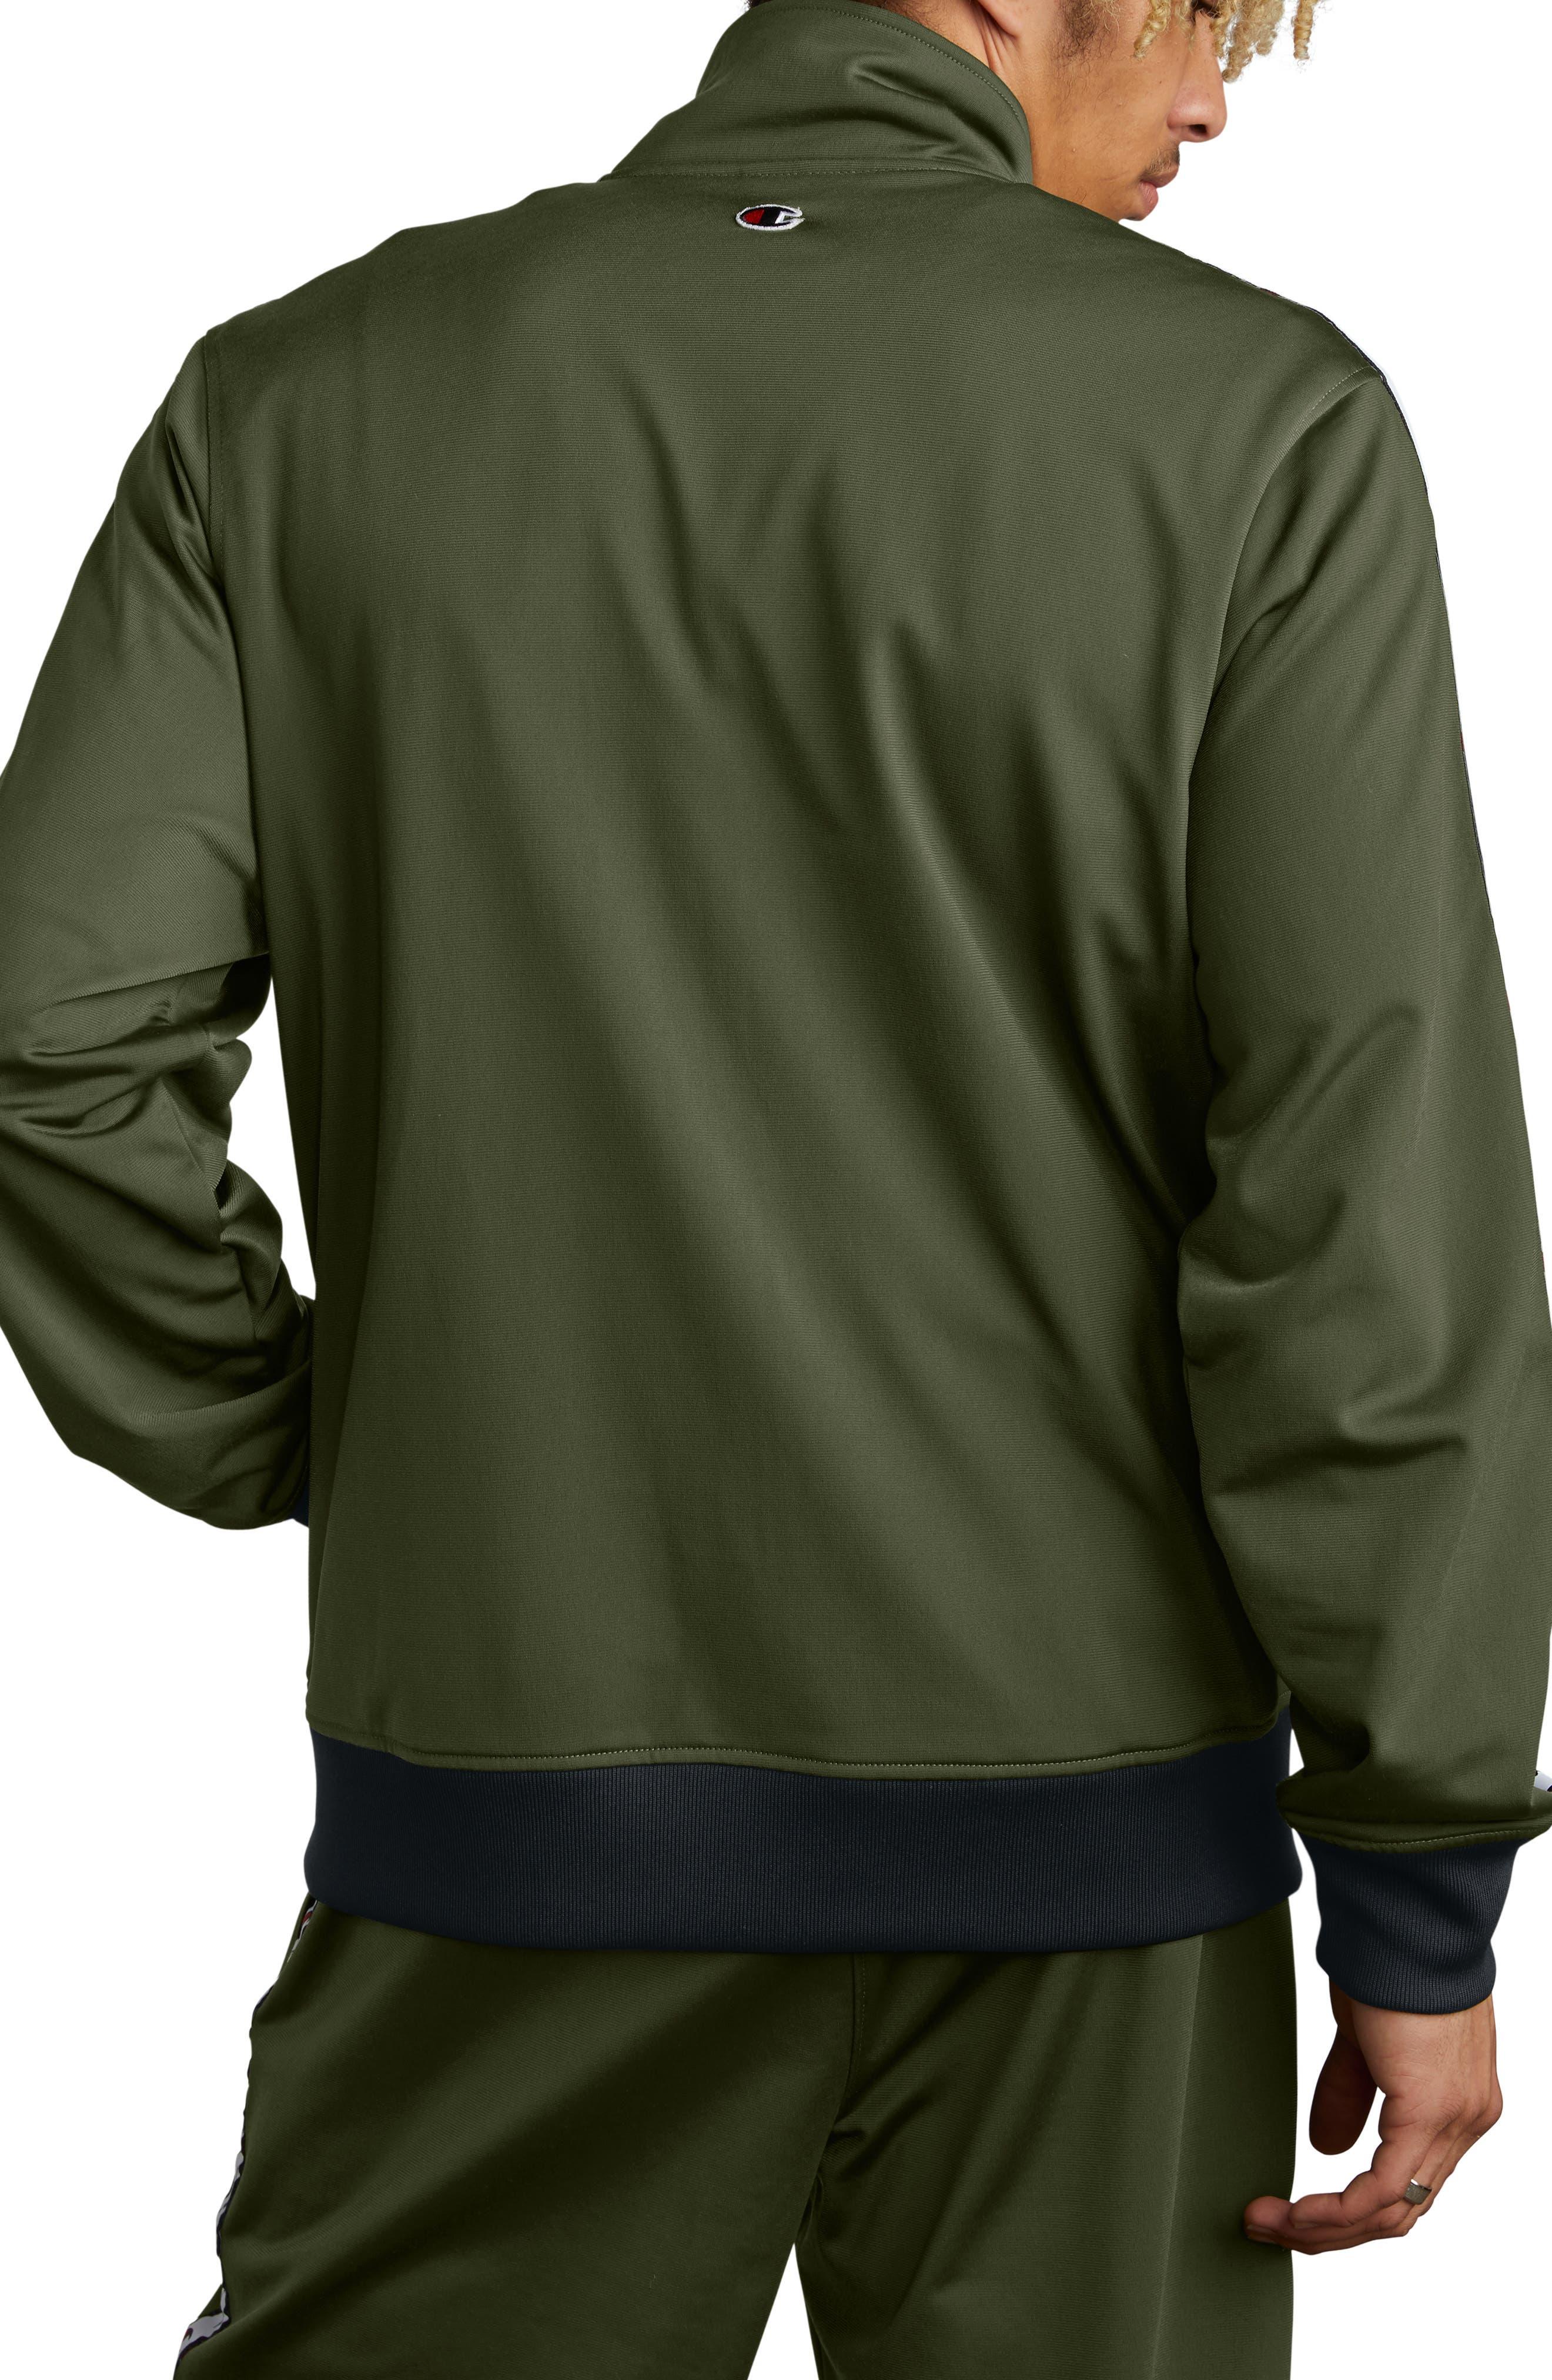 Track Jacket,                             Alternate thumbnail 2, color,                             HIKER GREEN